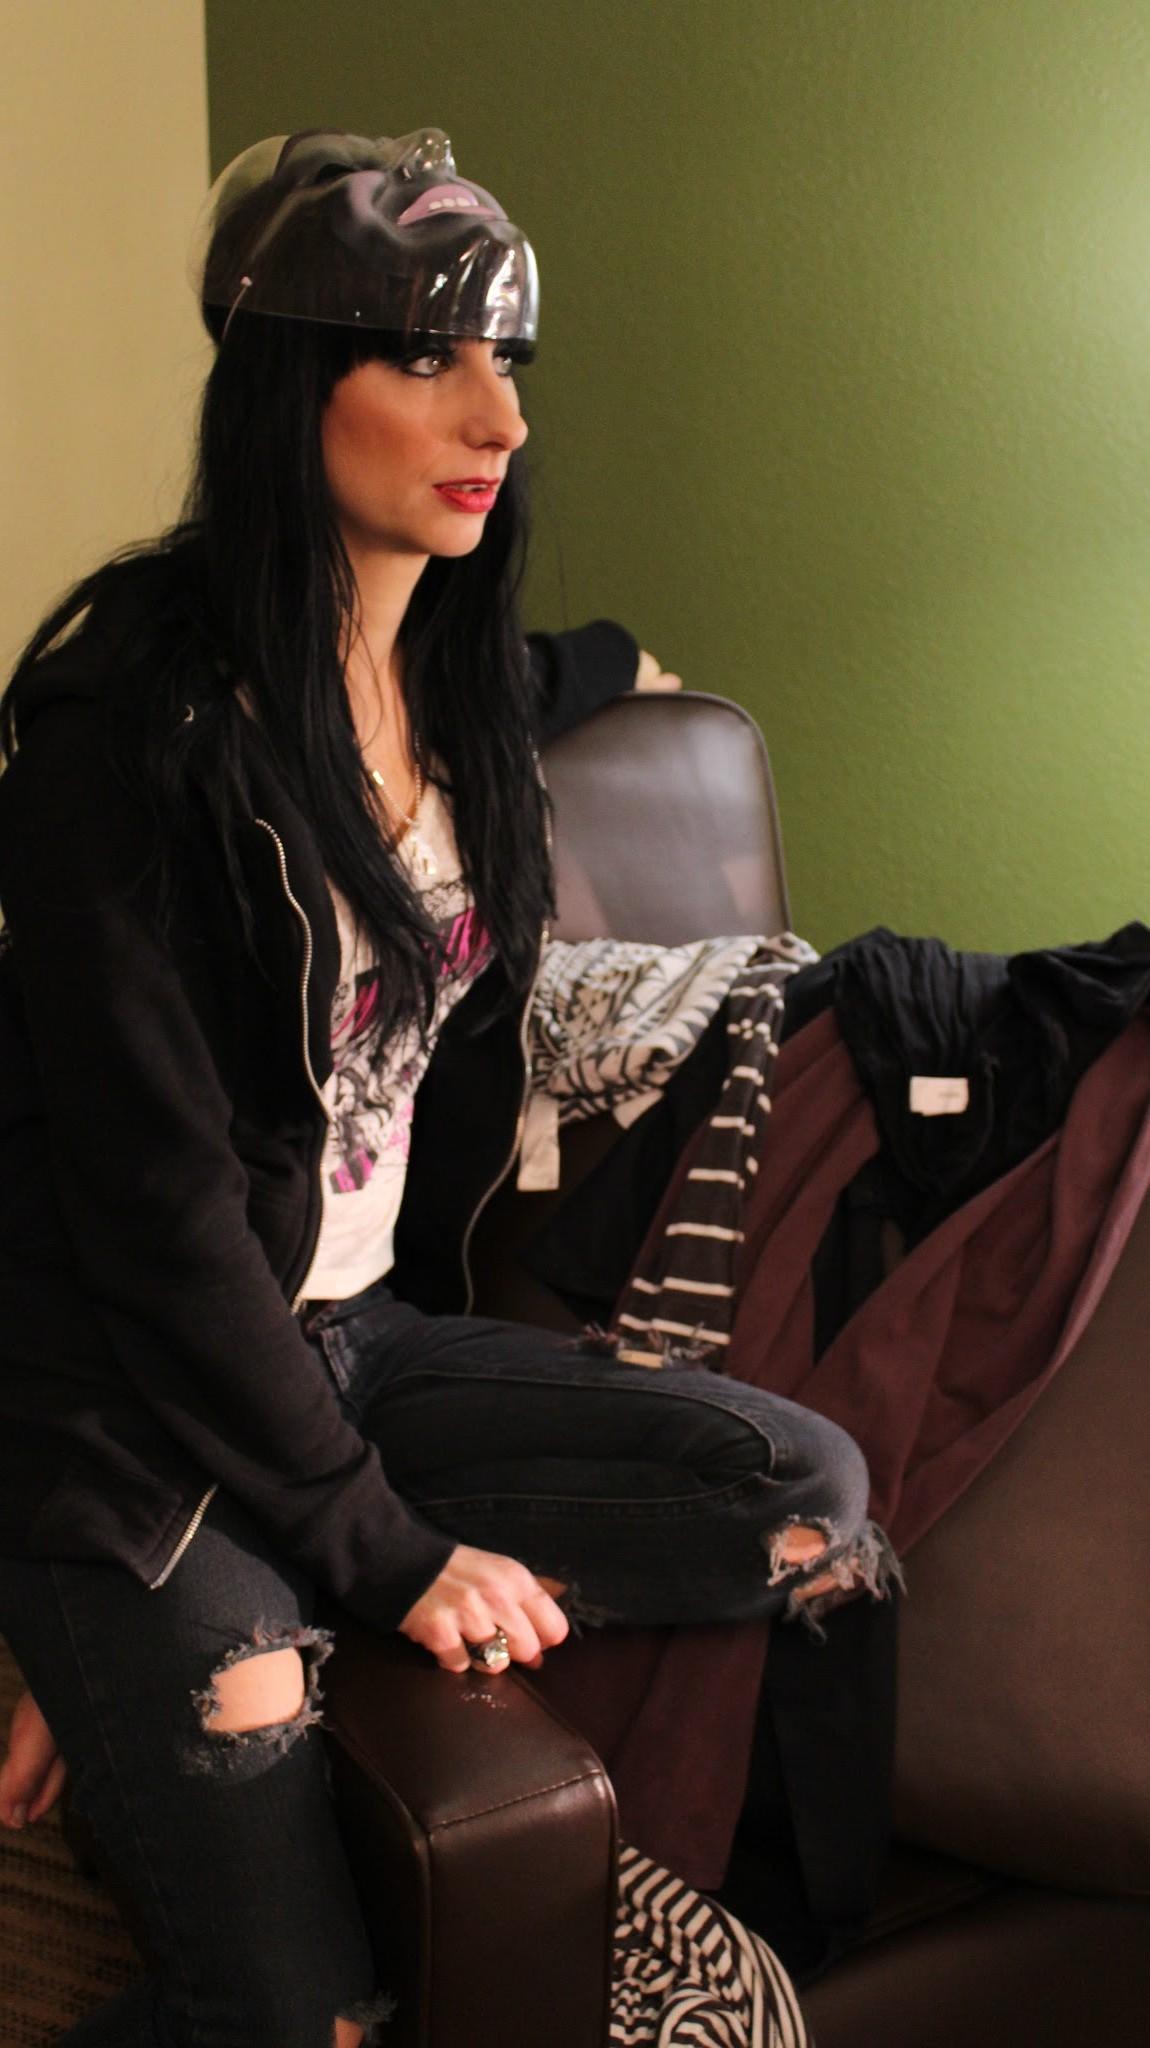 Sister Sin Videodreh zu 'Hearts Of Cold'